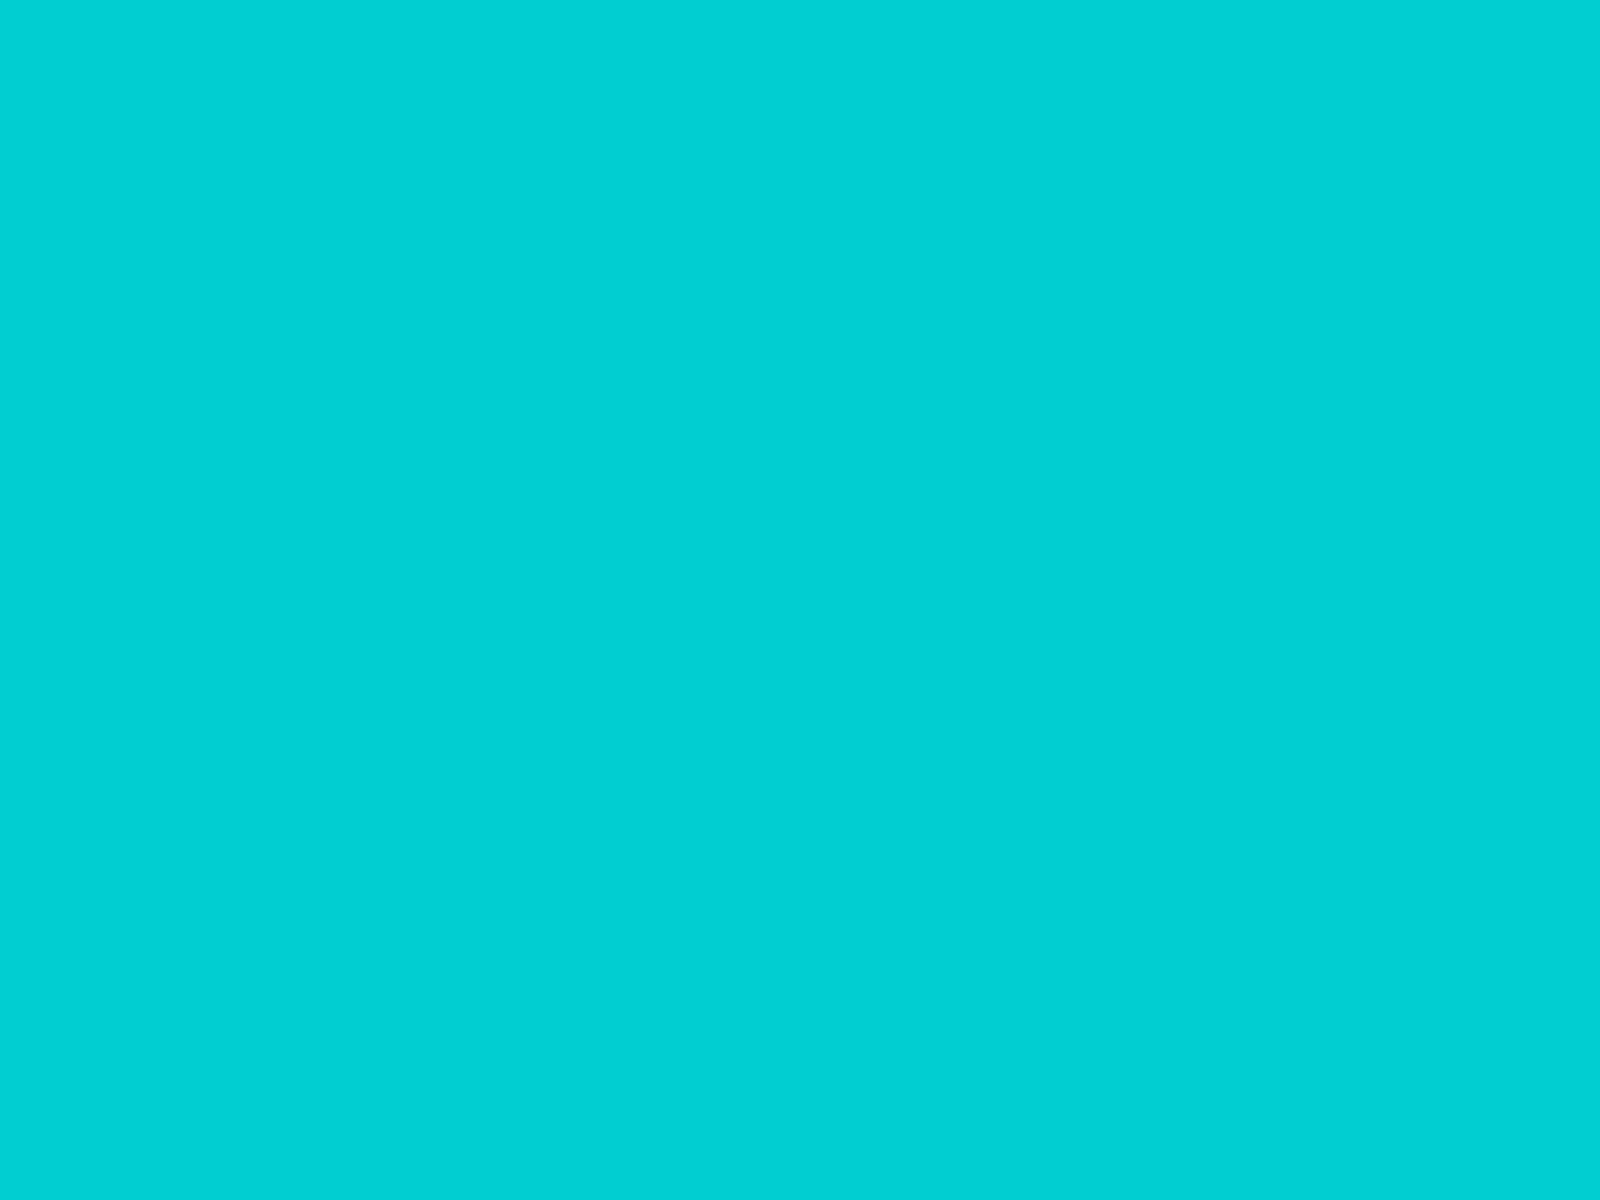 Turquoise Background Wallpapersafari